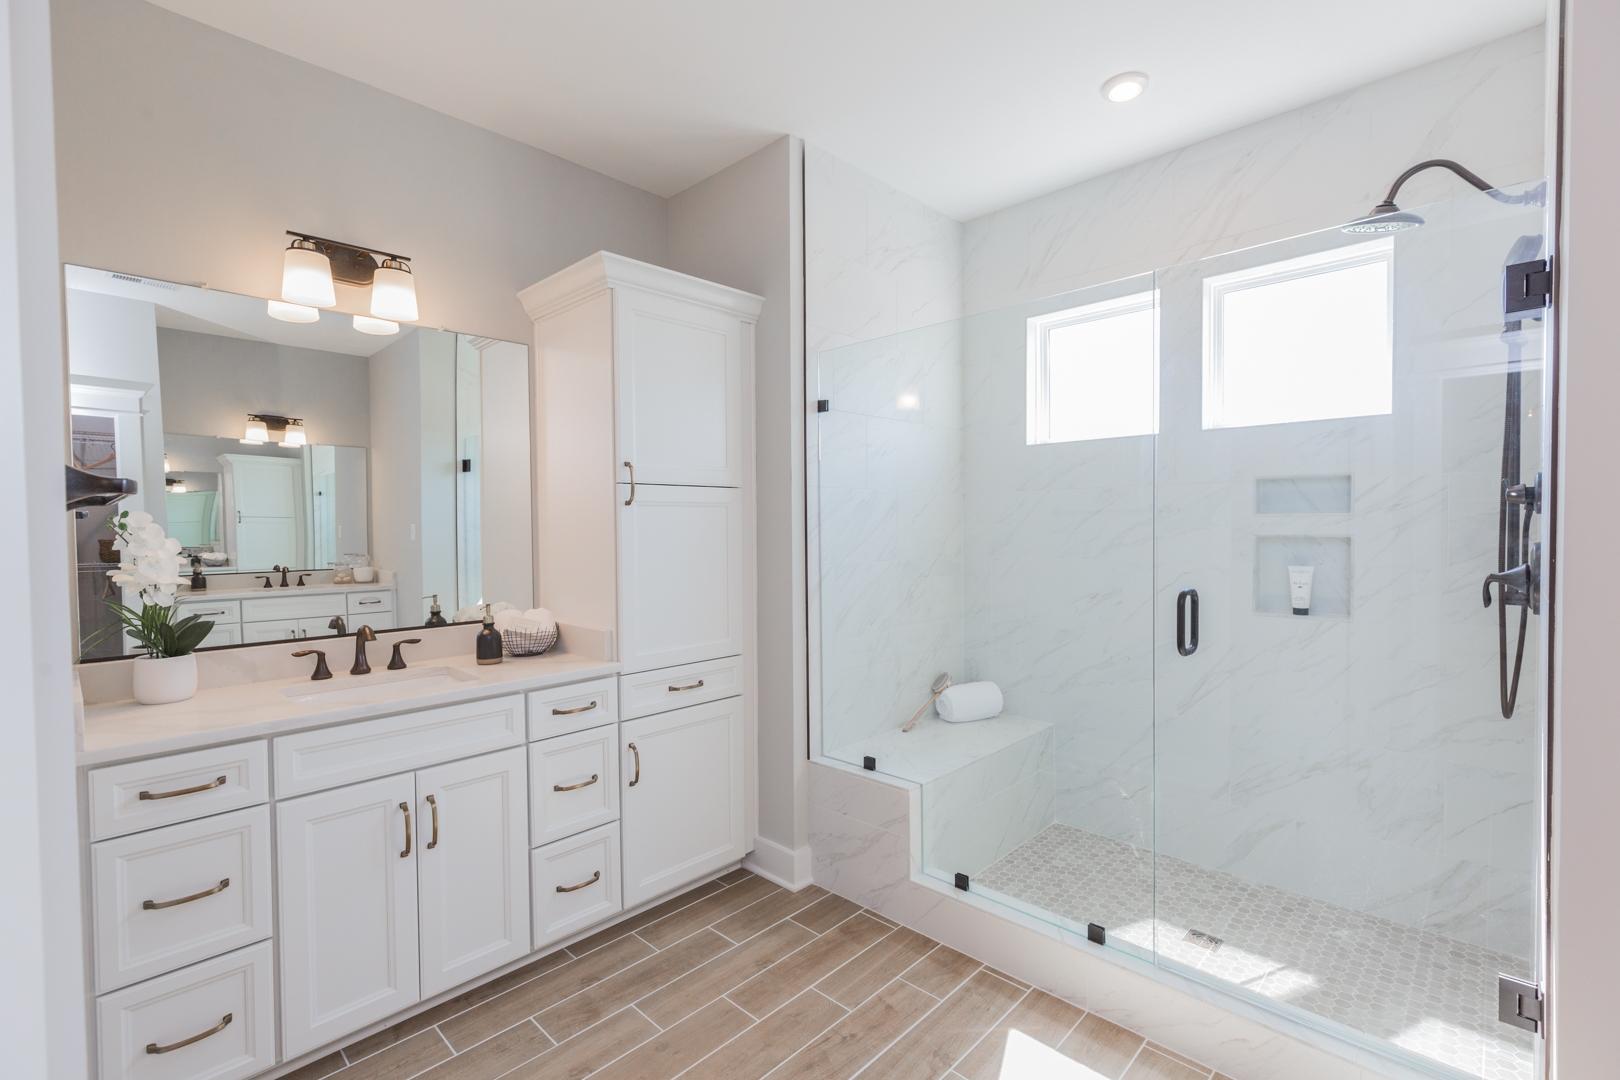 Roanoke Owner's Bathroom